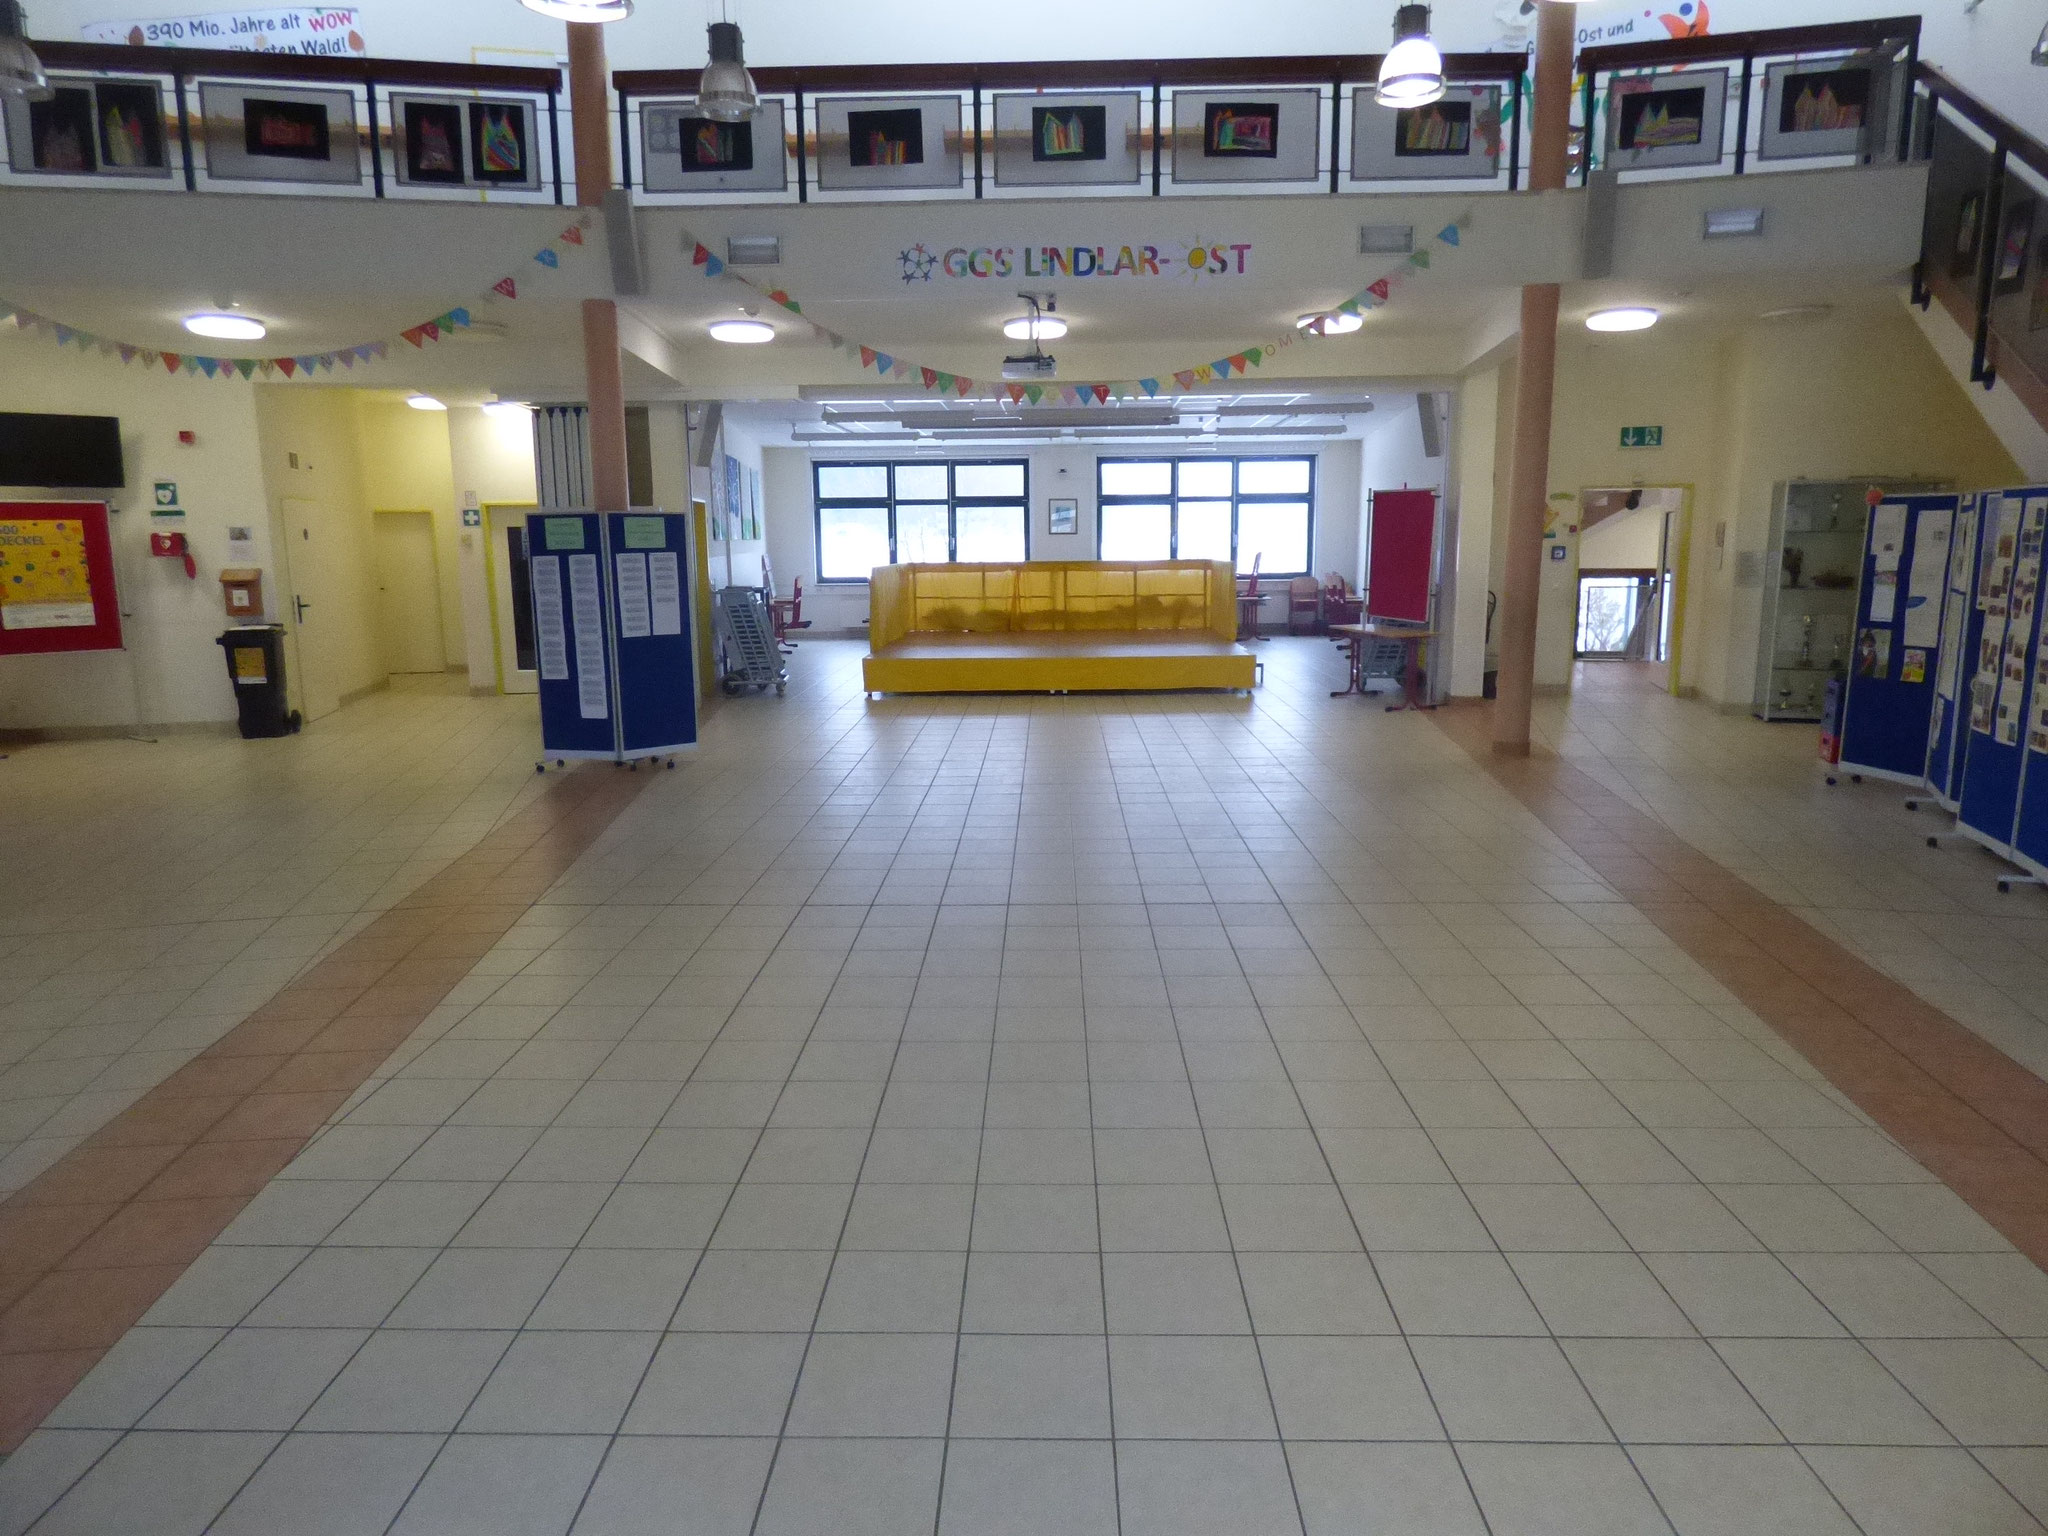 Grundschule Ost Foyer vom Eingang